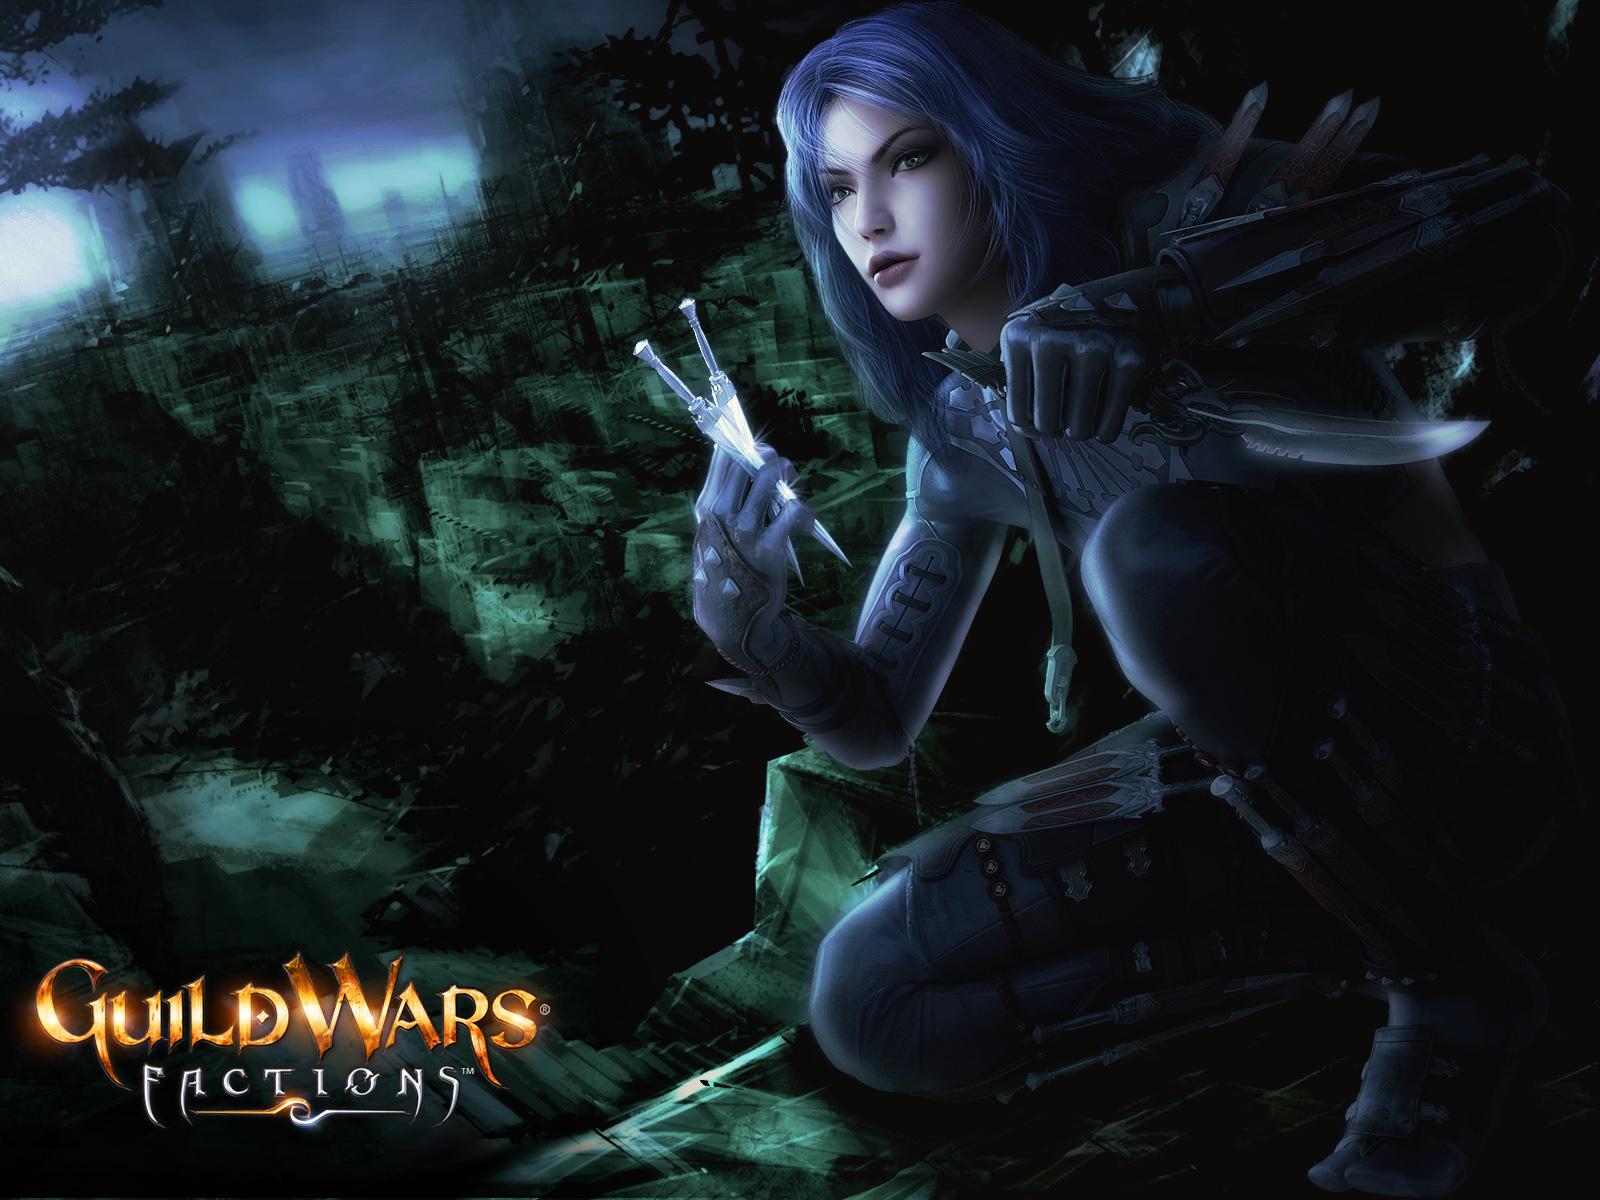 http://3.bp.blogspot.com/-GWzJgK9X4RA/TeDWsUzd84I/AAAAAAAACTQ/rEVsSY--oC0/s1600/Guild_wars_faction_.jpg